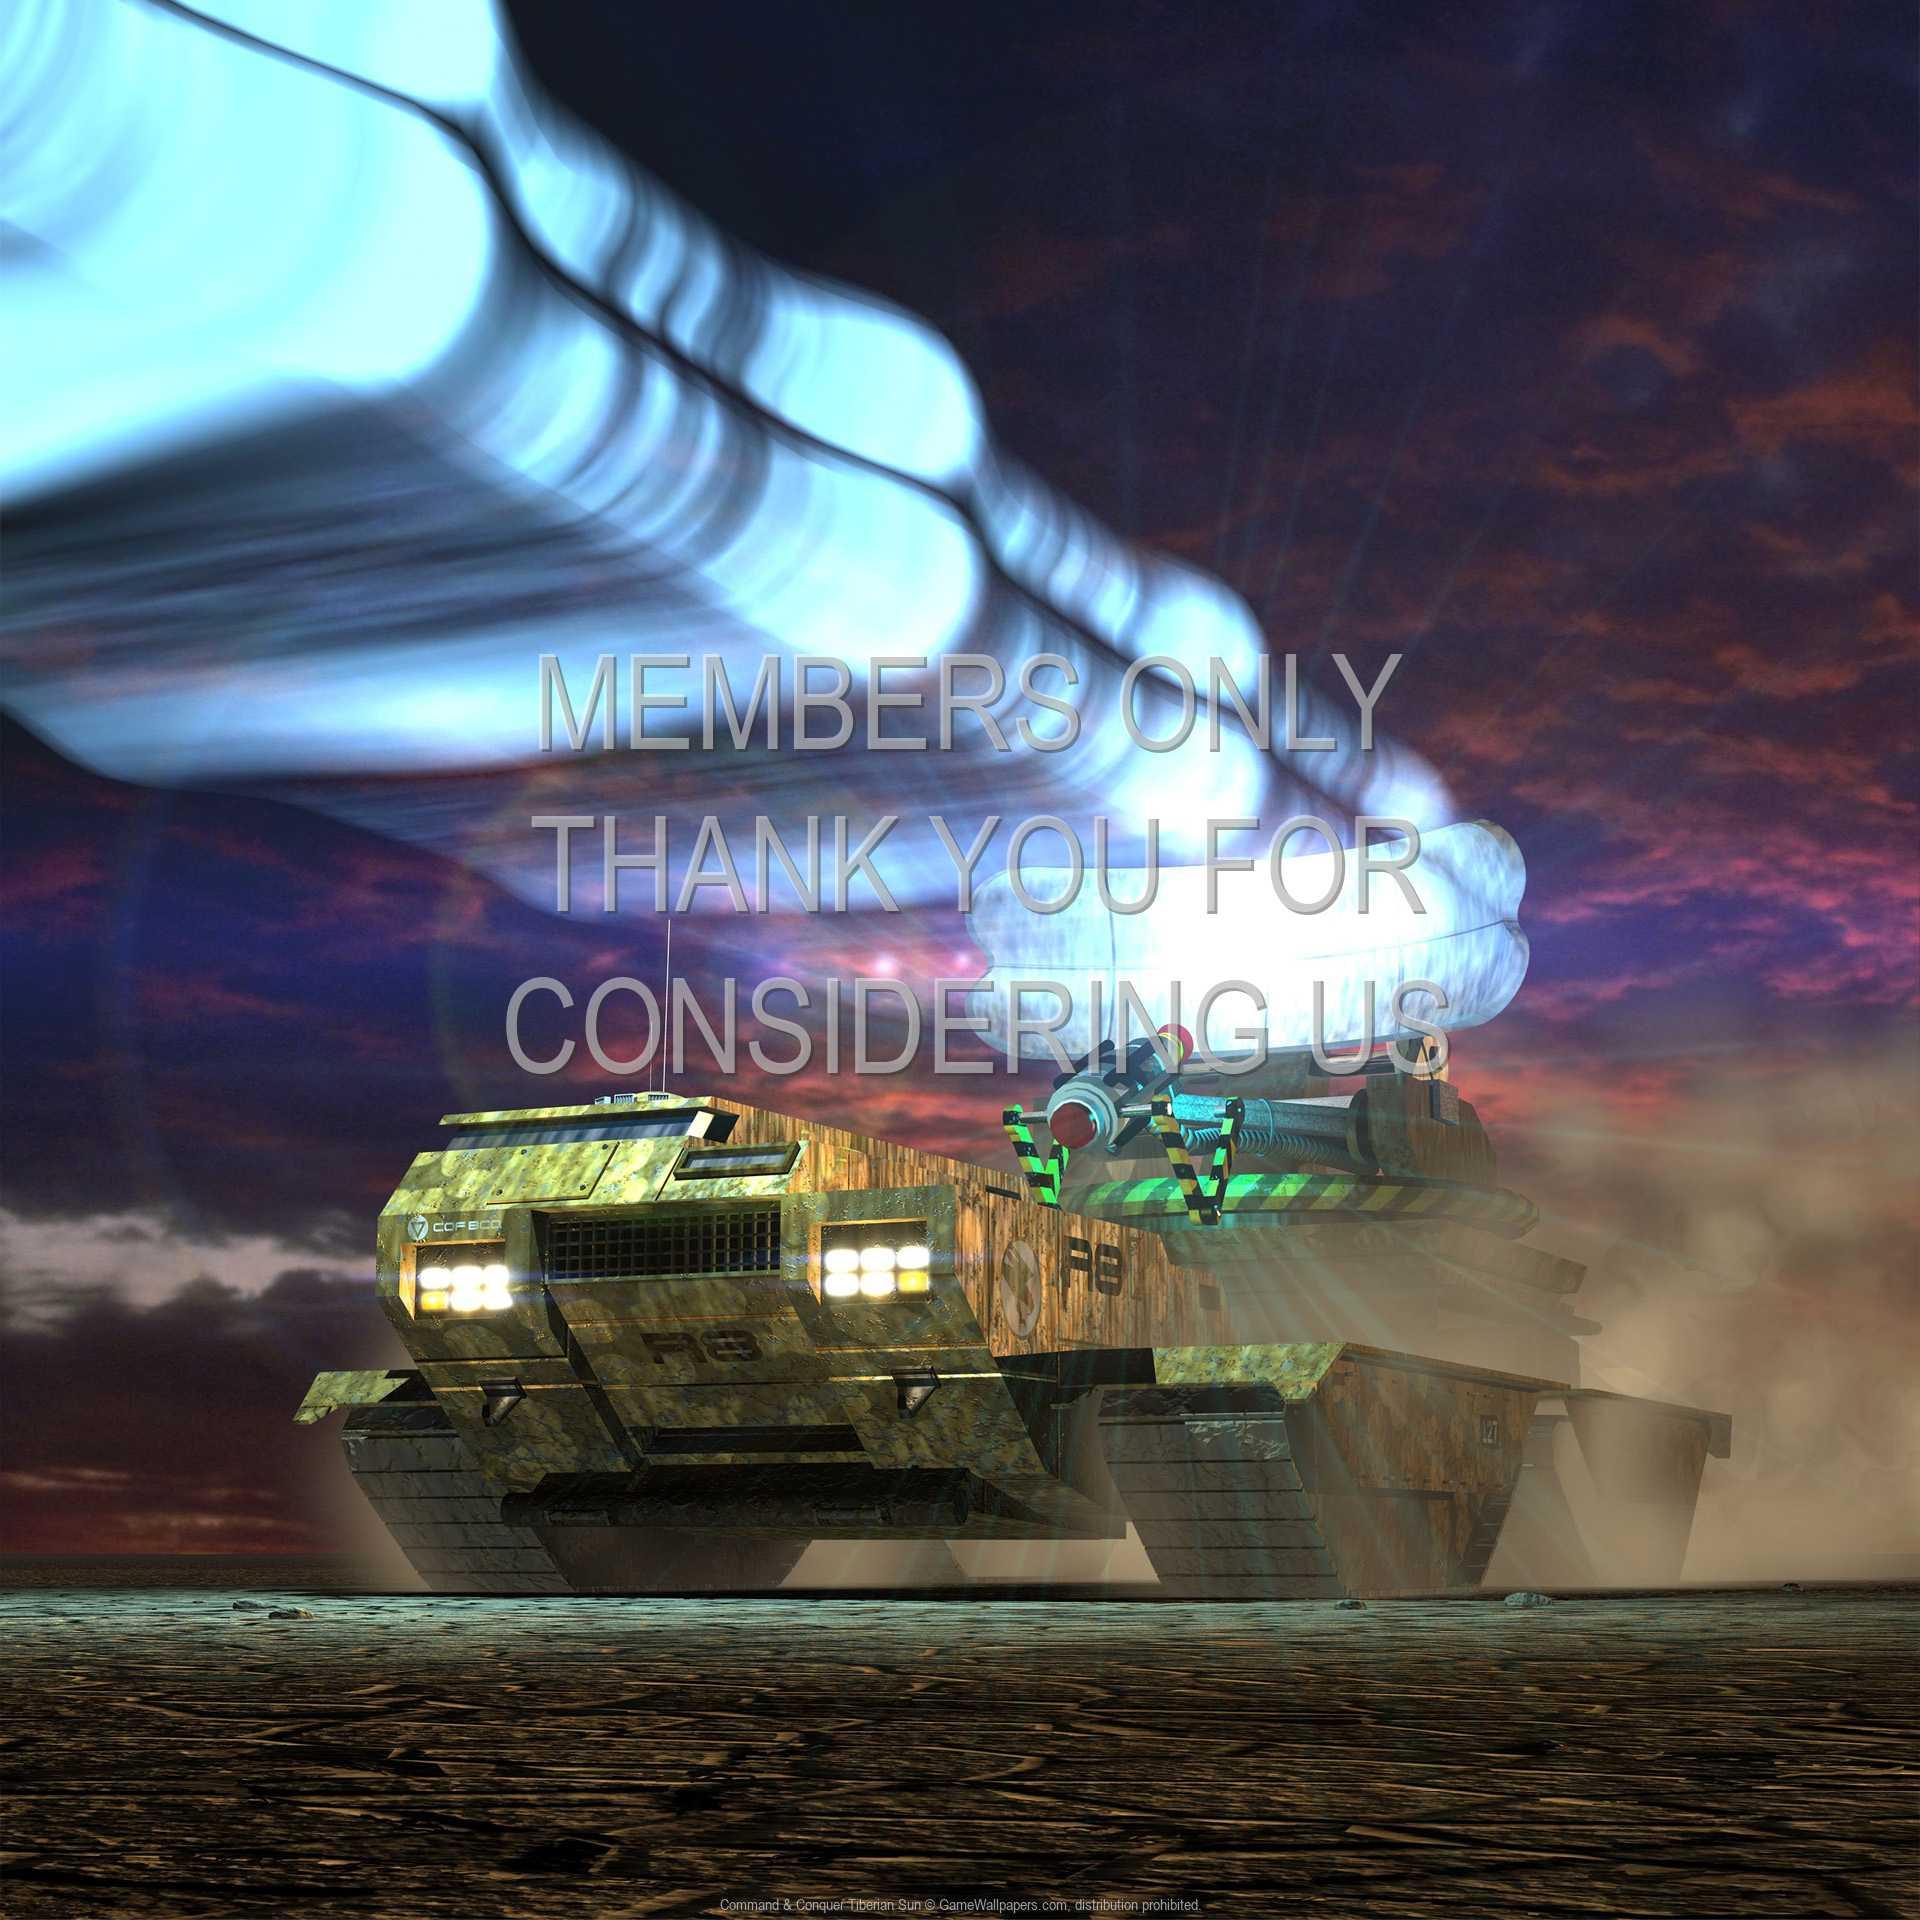 Command & Conquer: Tiberian Sun 1080p Horizontal Handy Hintergrundbild 01